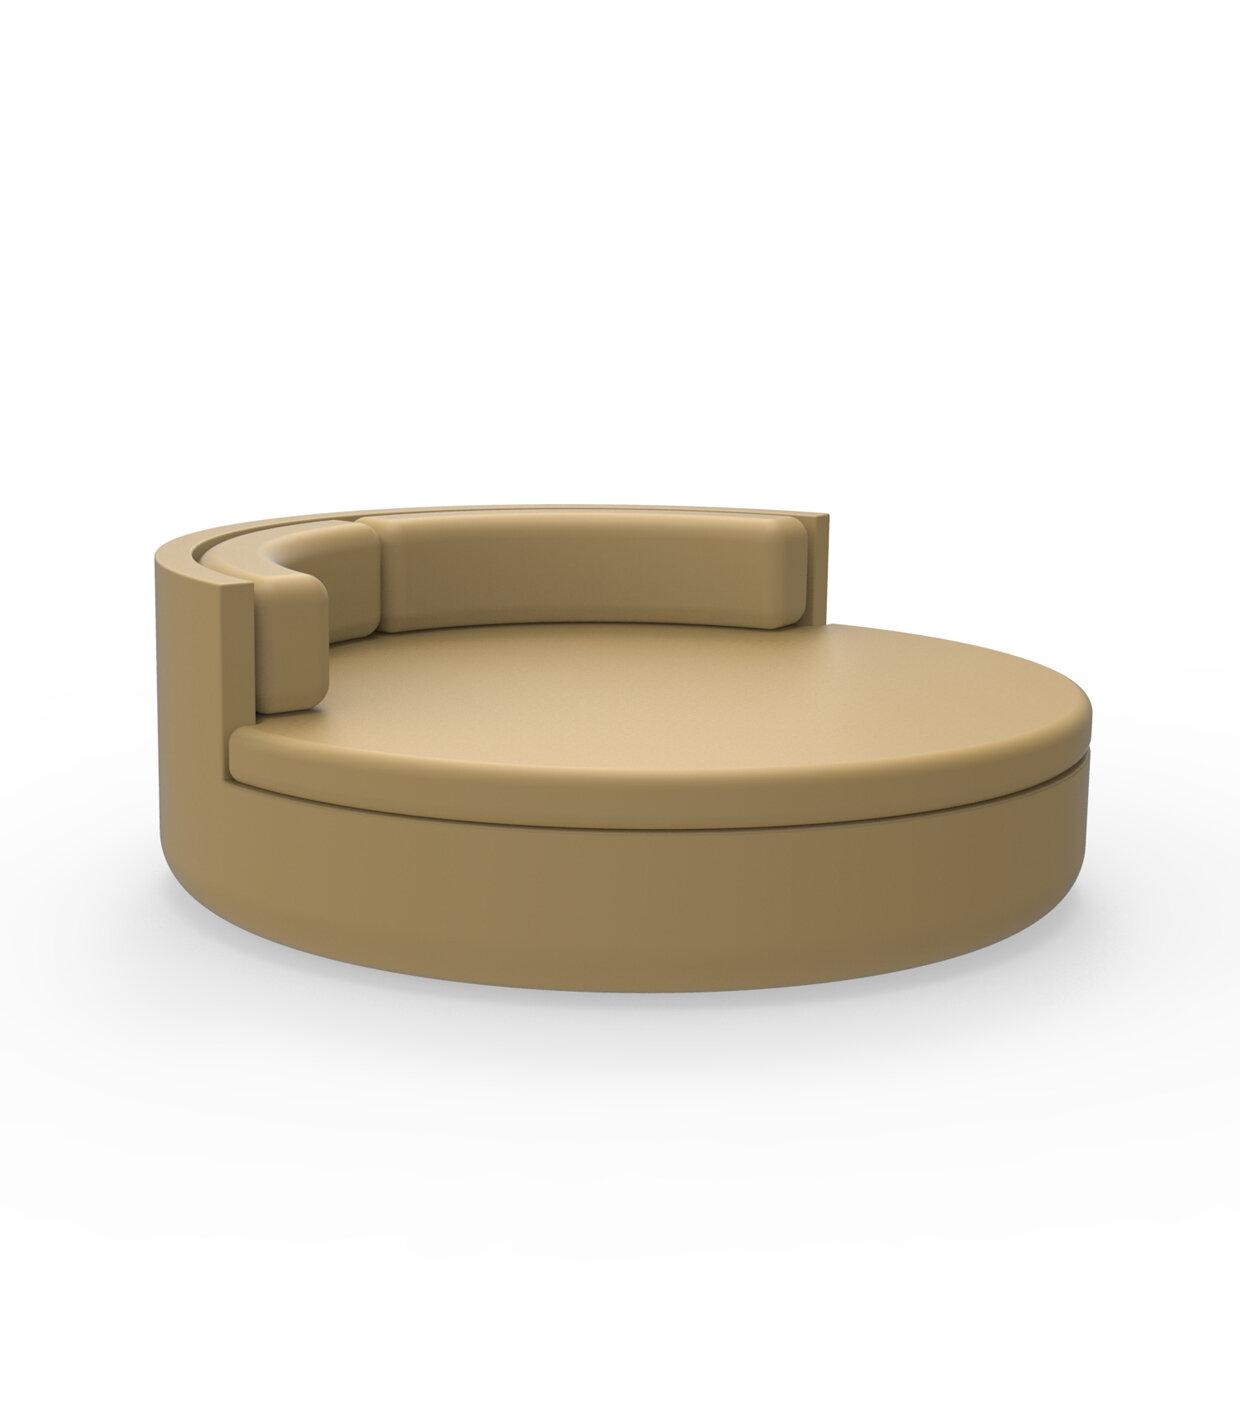 Vondom Ulm Patio Daybed With Cushions Perigold